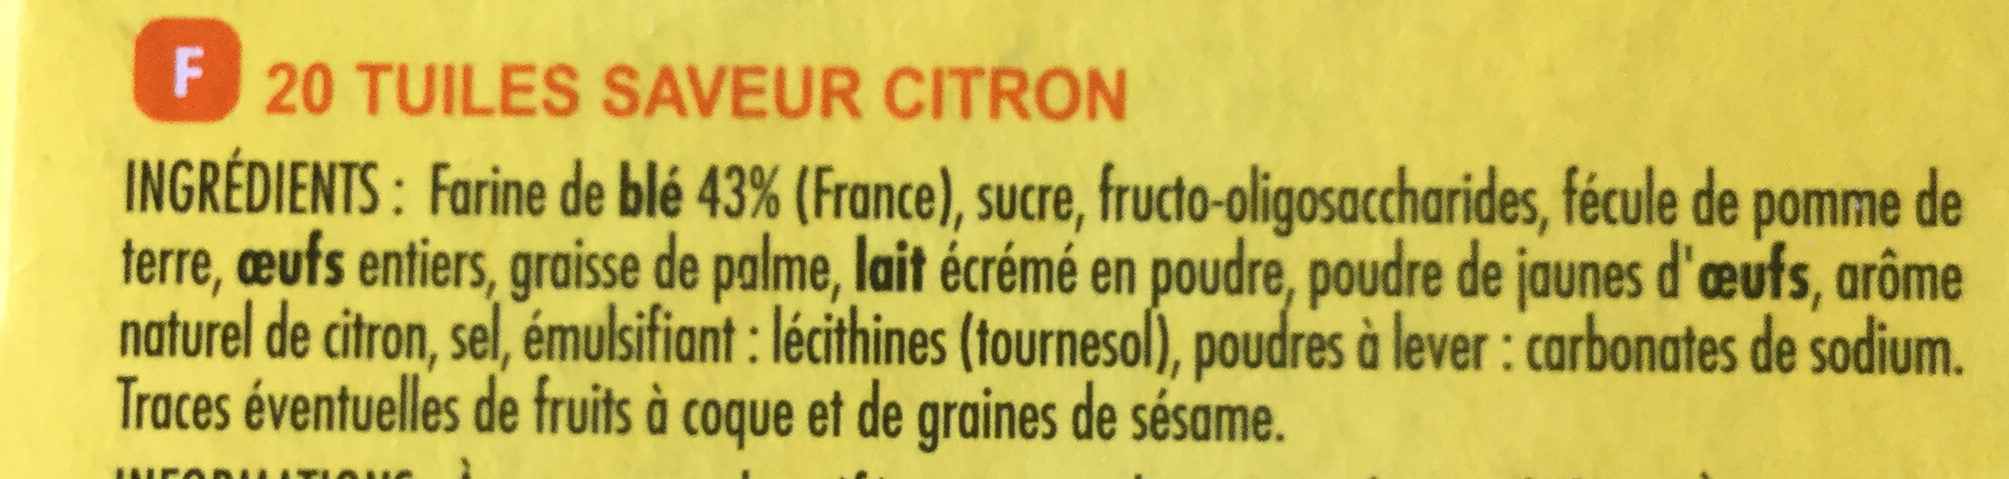 Tuiles Saveur Citron - Ingredients - fr